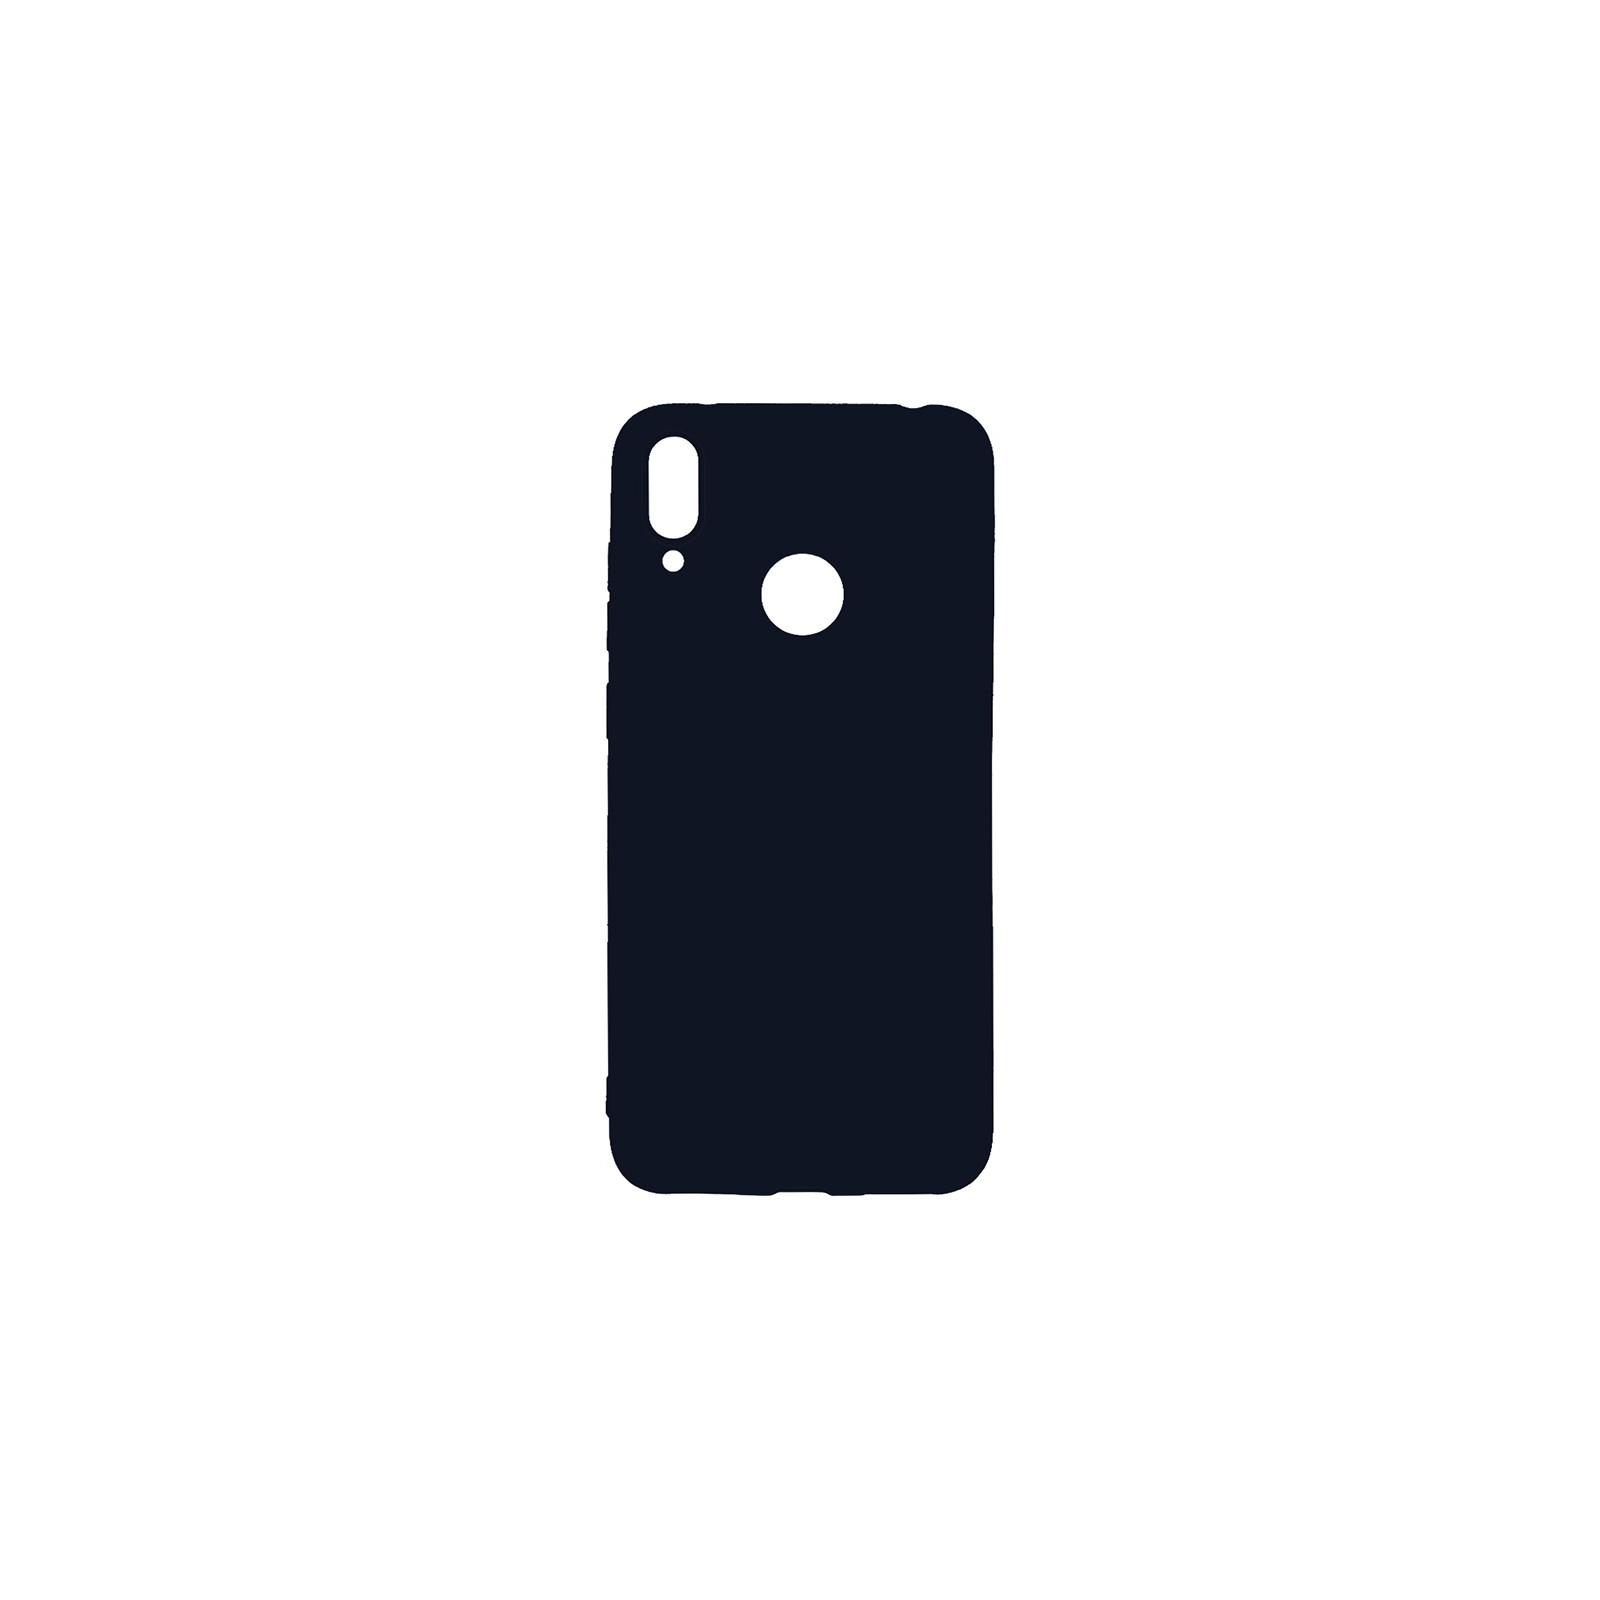 Чехол для моб. телефона Toto 1mm Matt TPU Case Huawei Y7 2019 Black (F_93947)